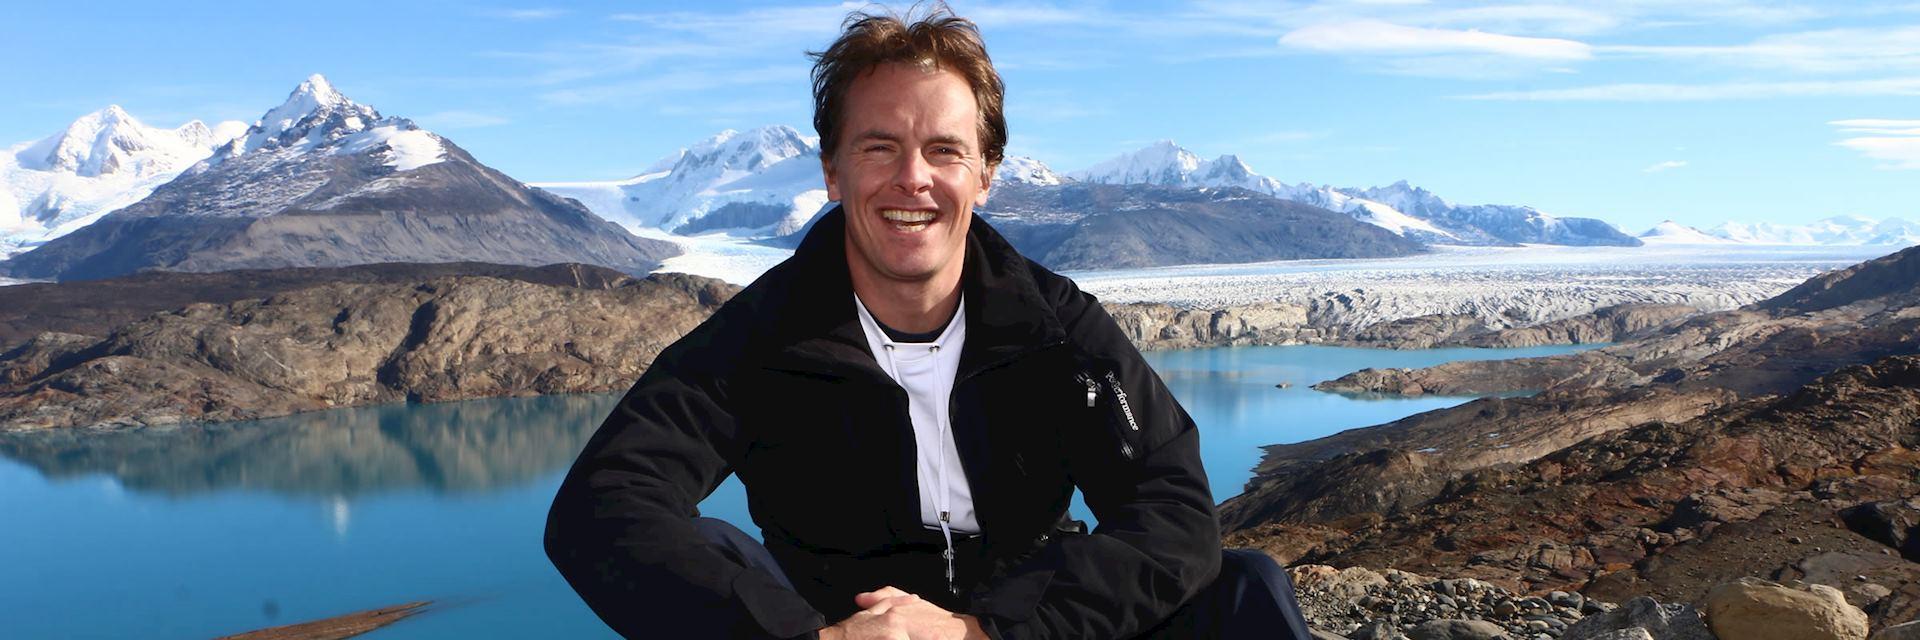 Mark in Patagonia, Argentina